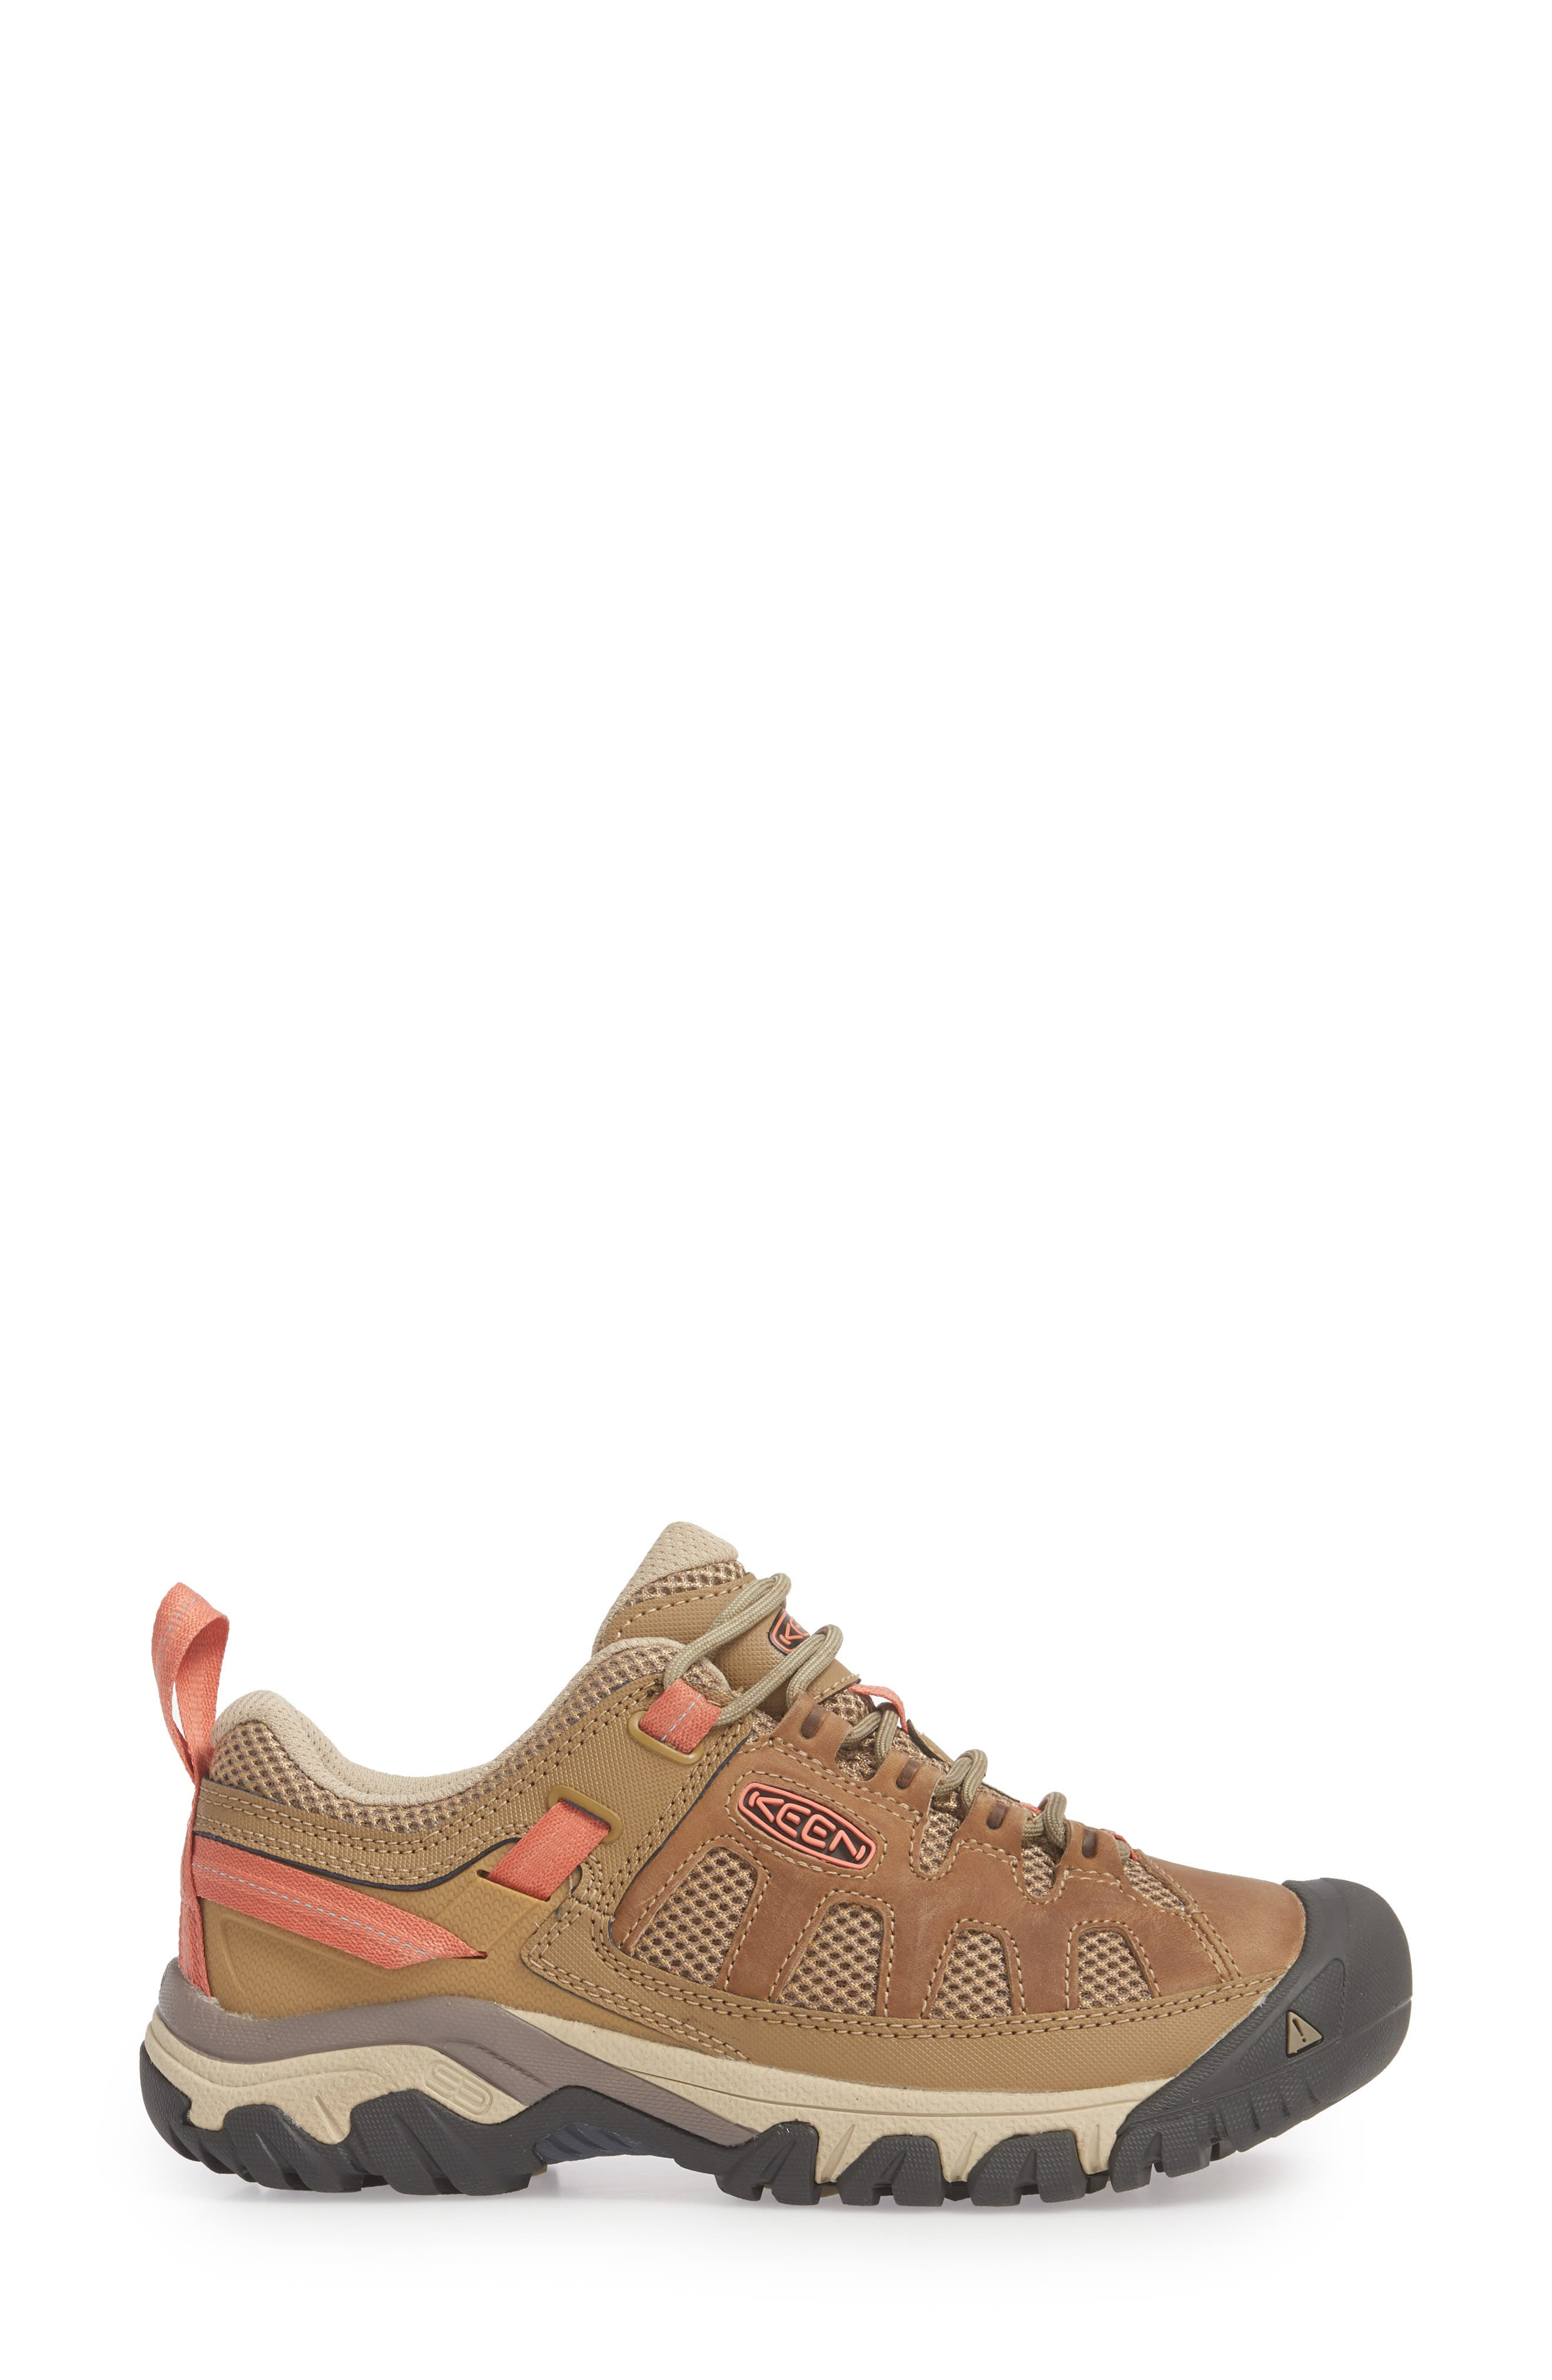 Targhee Vent Hiking Shoe,                             Alternate thumbnail 3, color,                             Sandy/ Cornstalk Leather